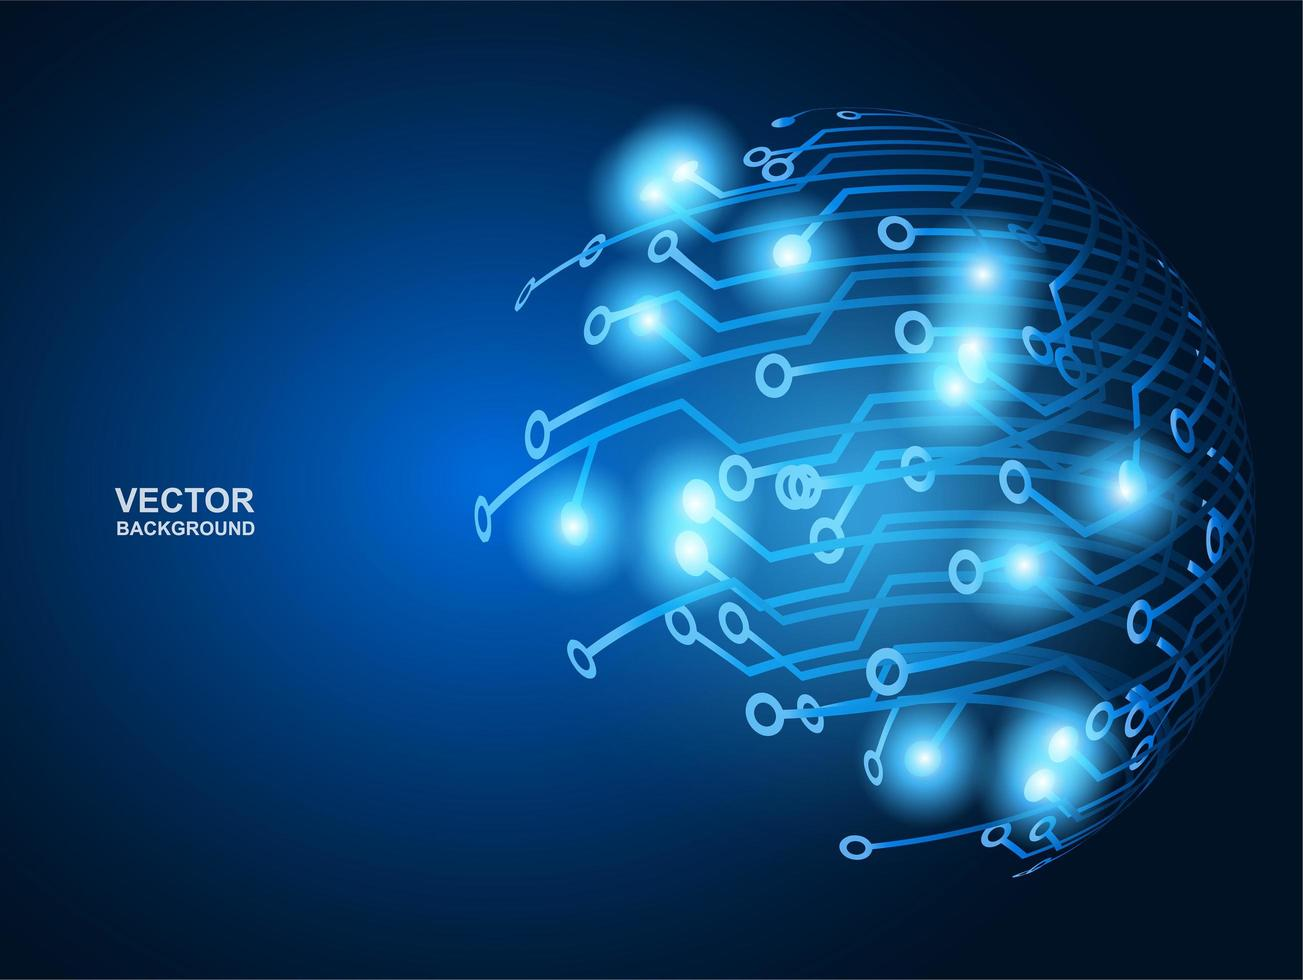 Hi-Tech leuchtend blauer Kreis Kreis Design vektor